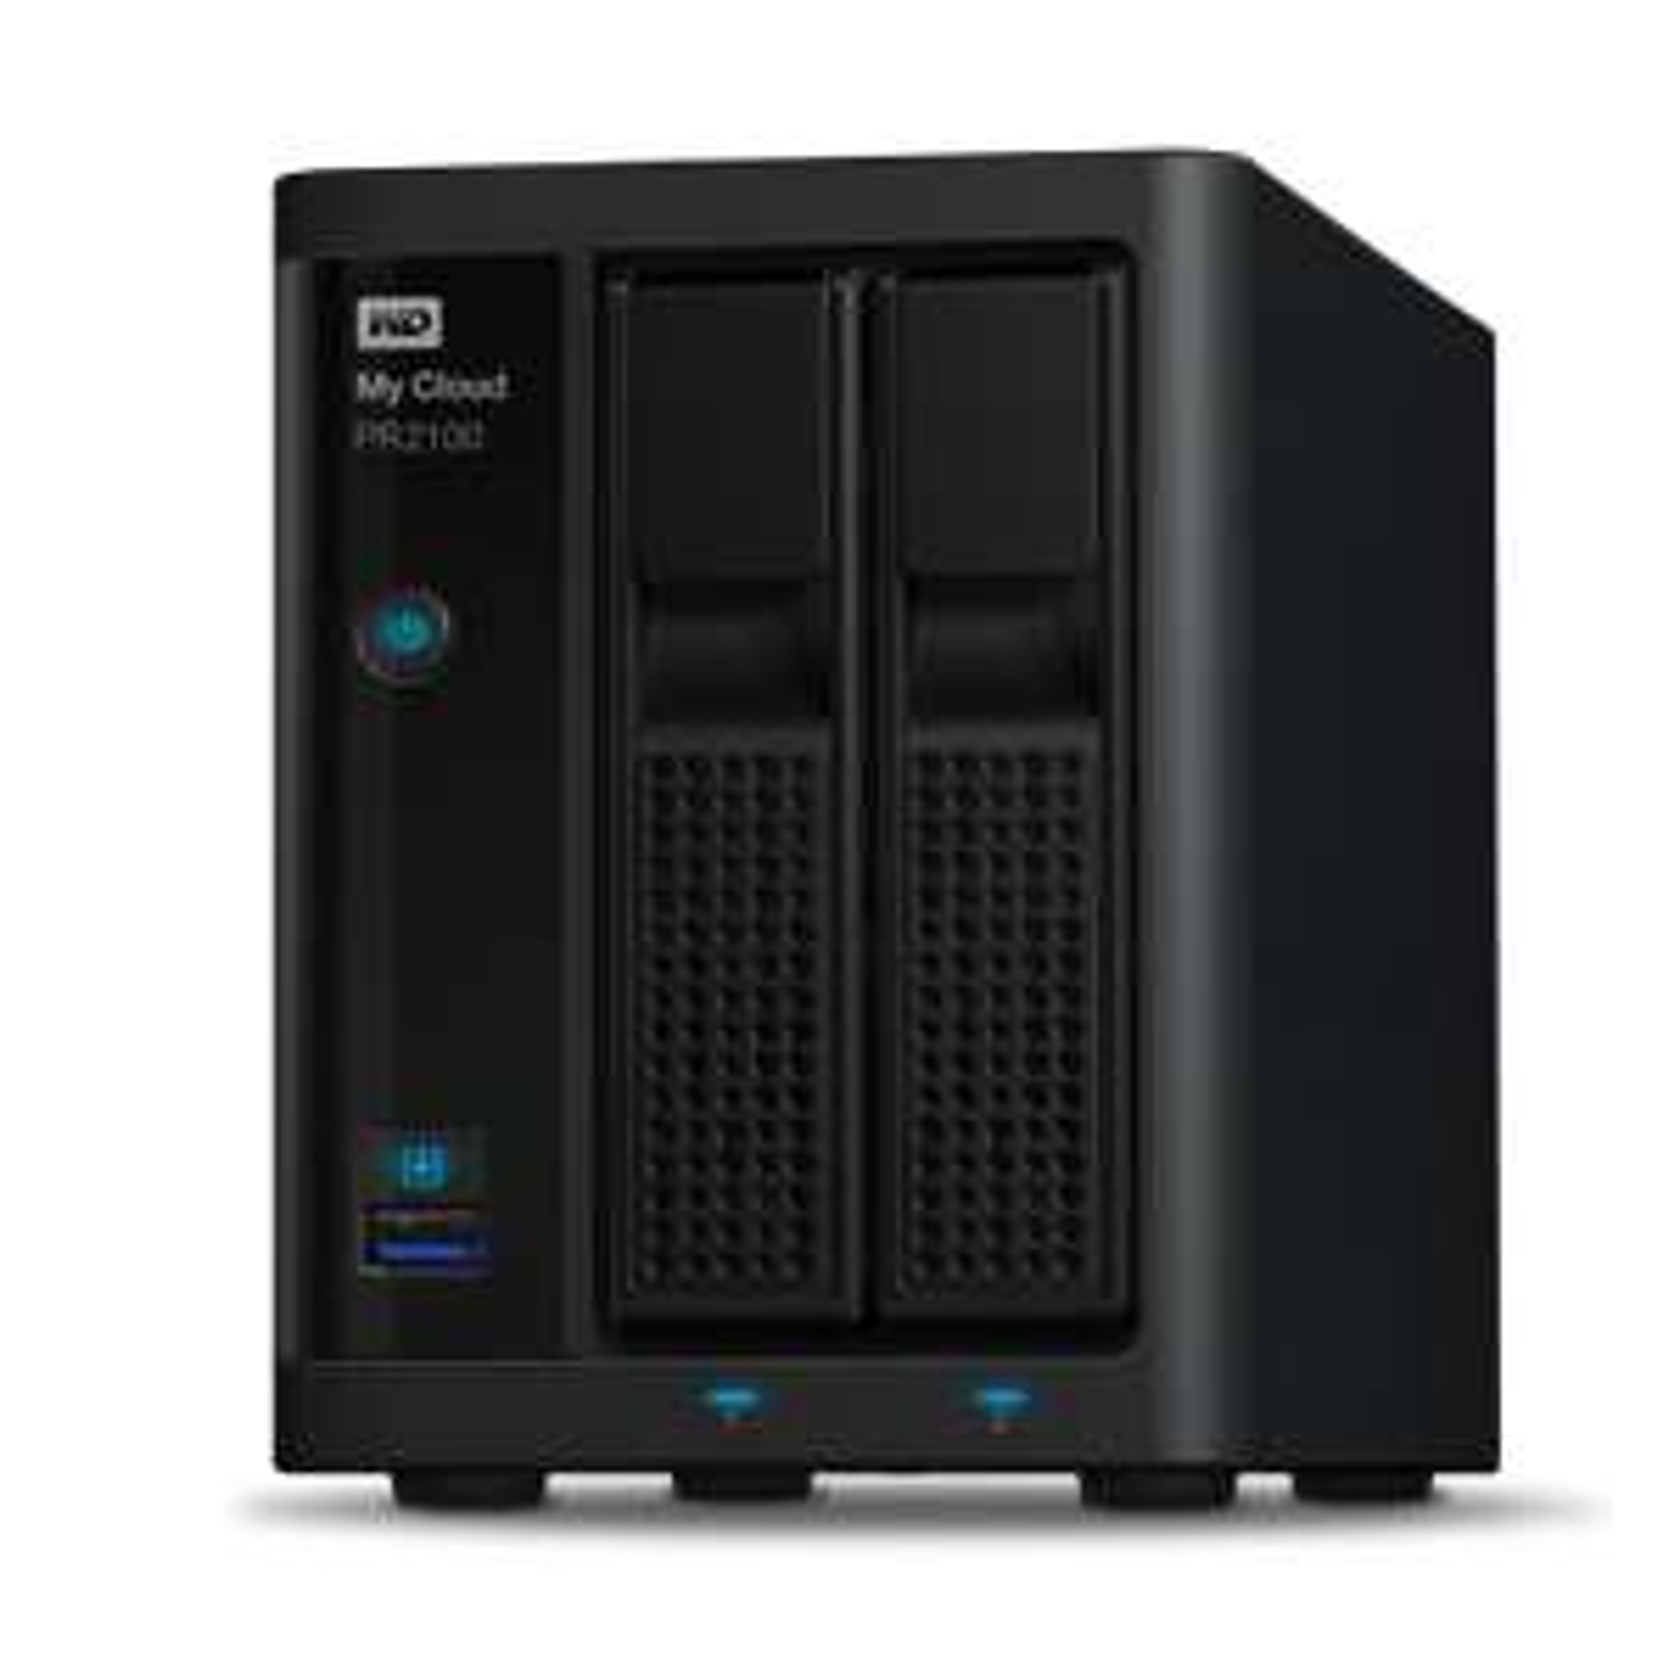 WD My Cloud PR2100 20TB (2 * 10TB Drives) £799 Delivered @ Western Digital